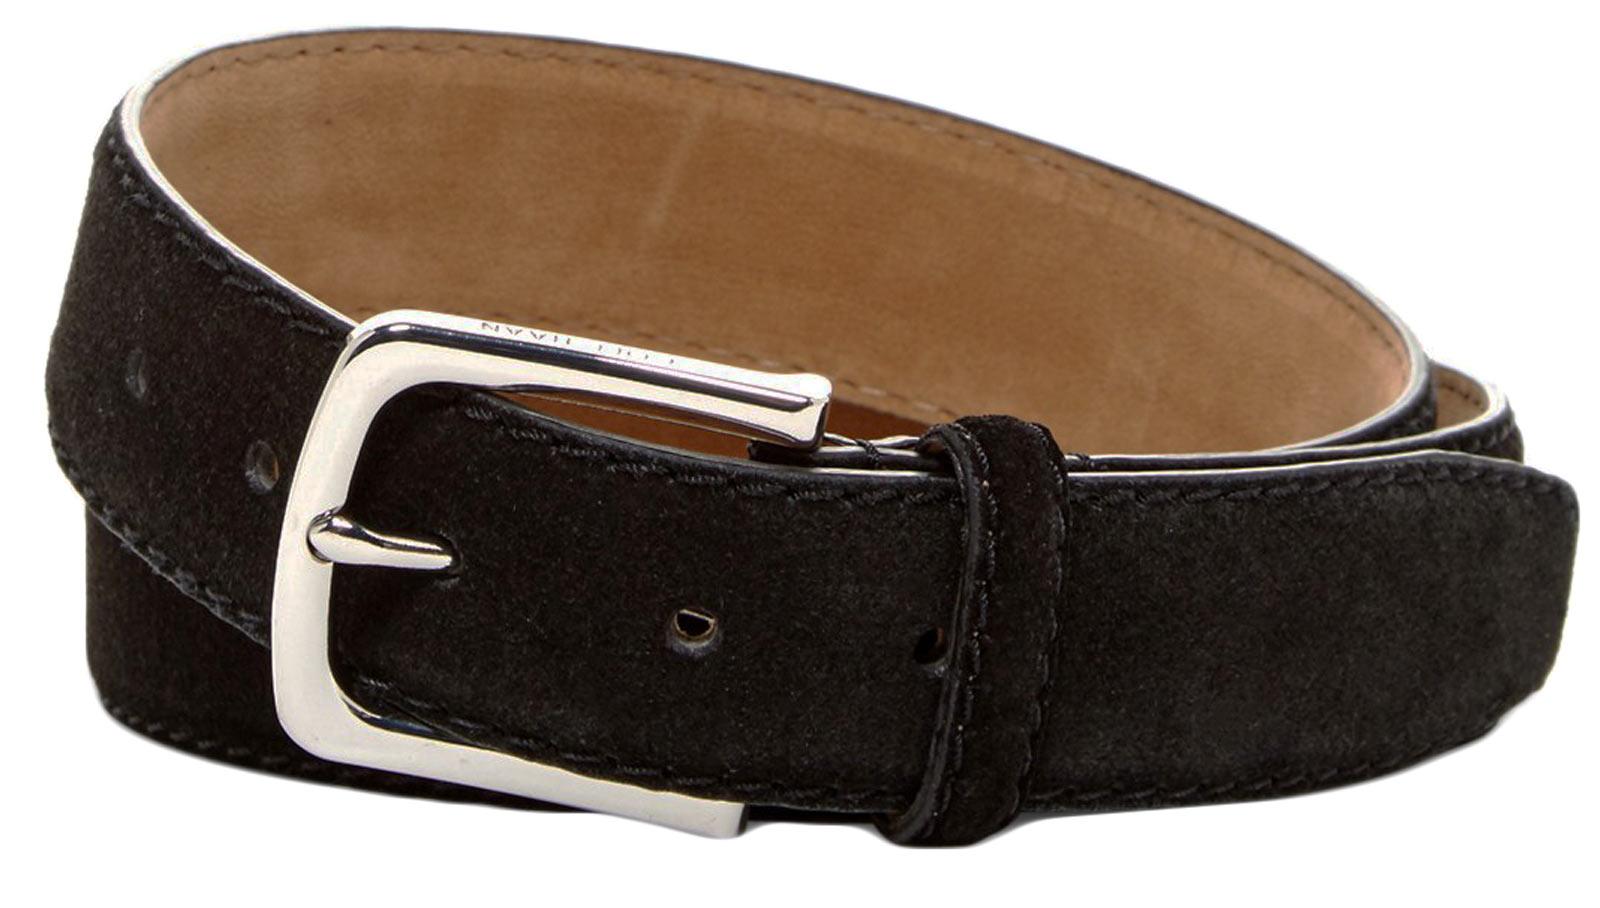 Cole Haan CHDM31034 BLK Men's Black Suede Leather